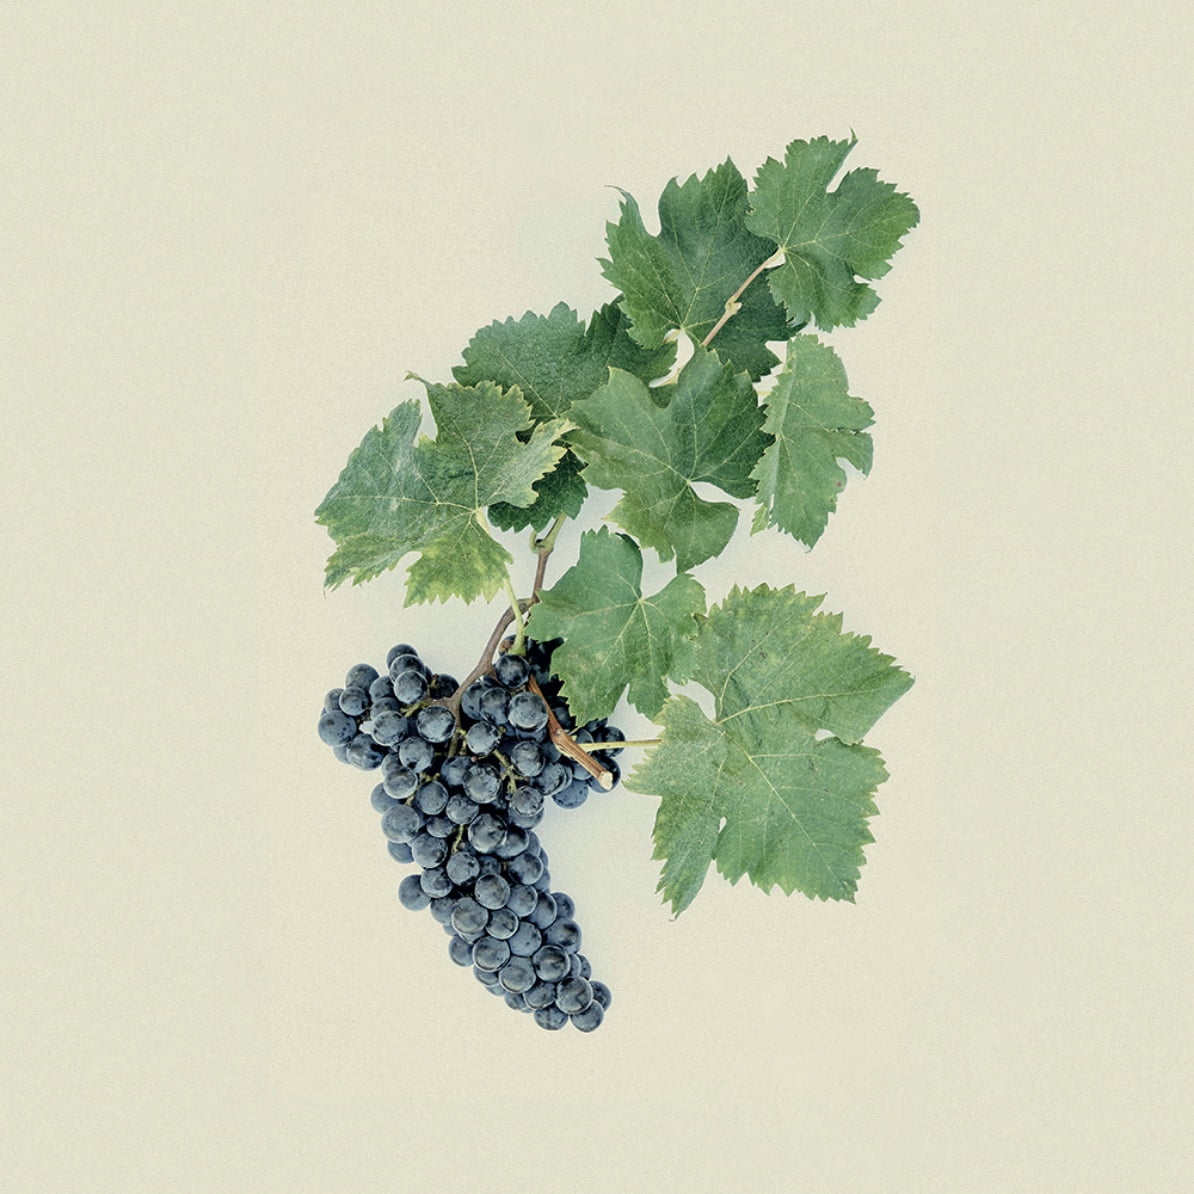 Vin Pauillac Médoc grape variety Cabernet franc